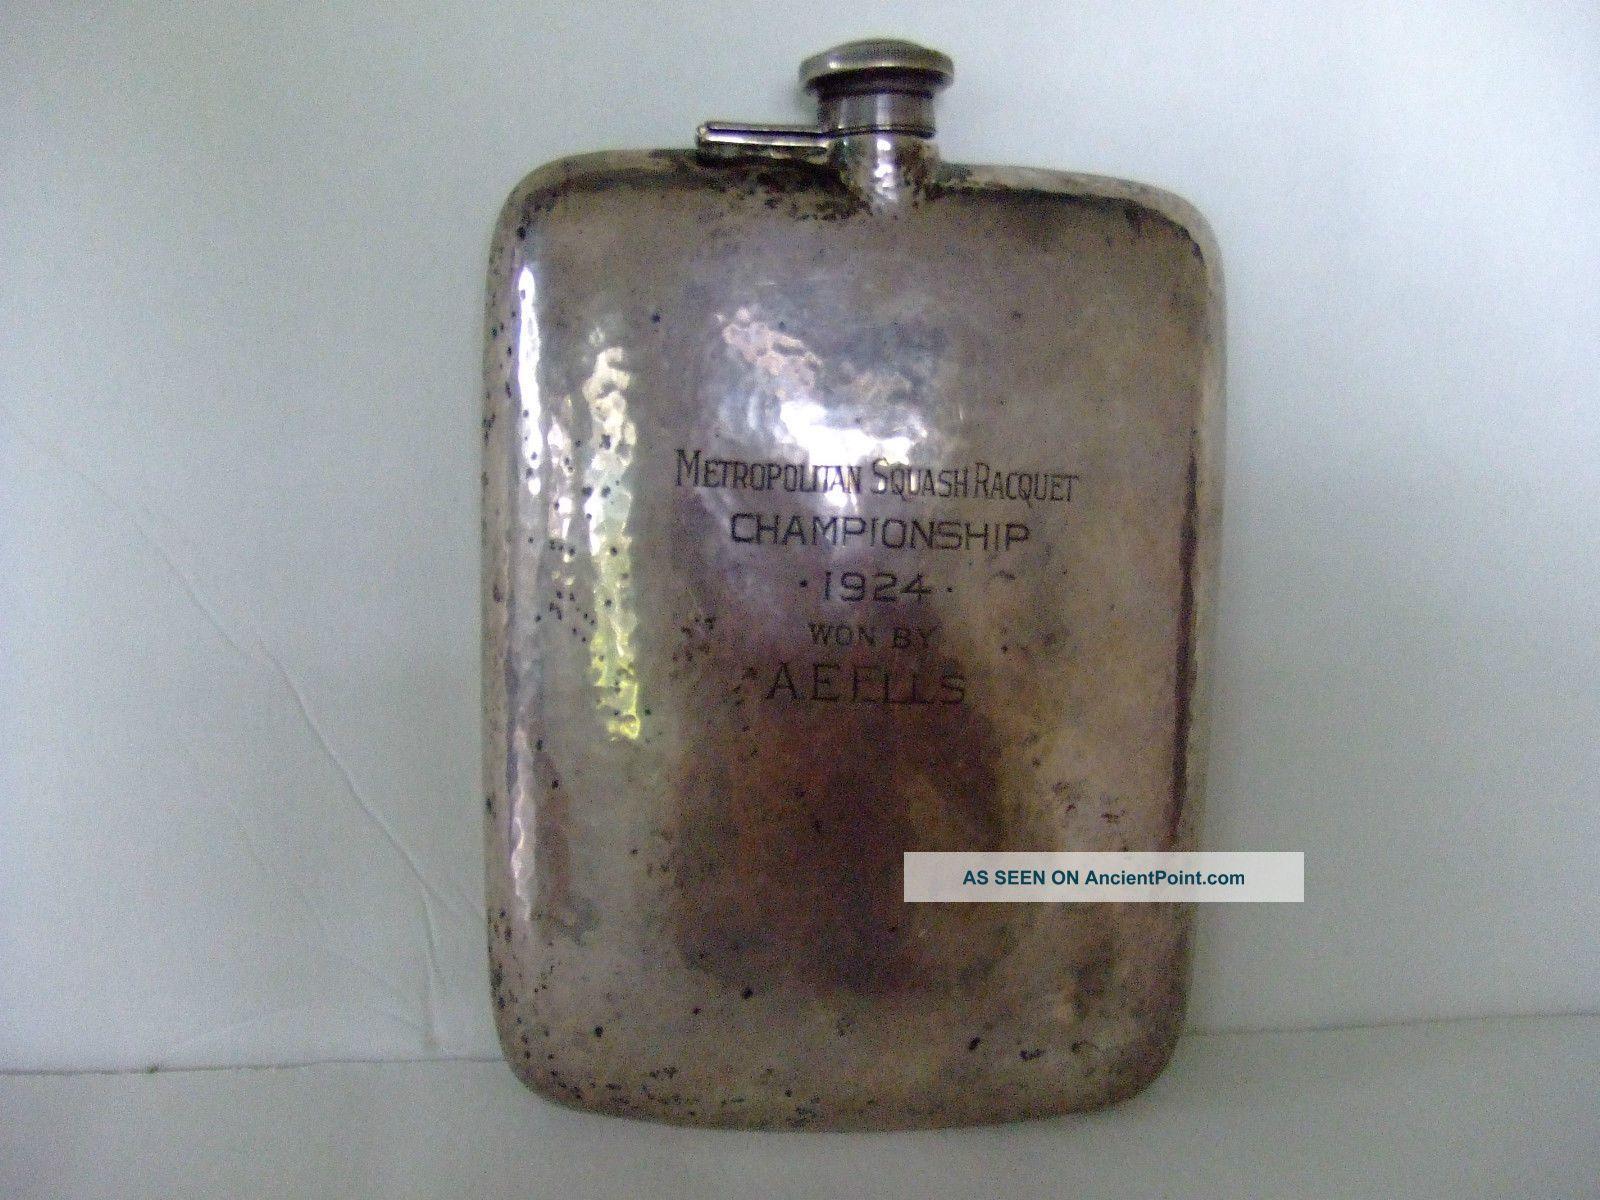 Harvard Squash Capt.  A E Ells Sterling Silver Flask 3/4 Pint 341 Grams Bottles, Decanters & Flasks photo